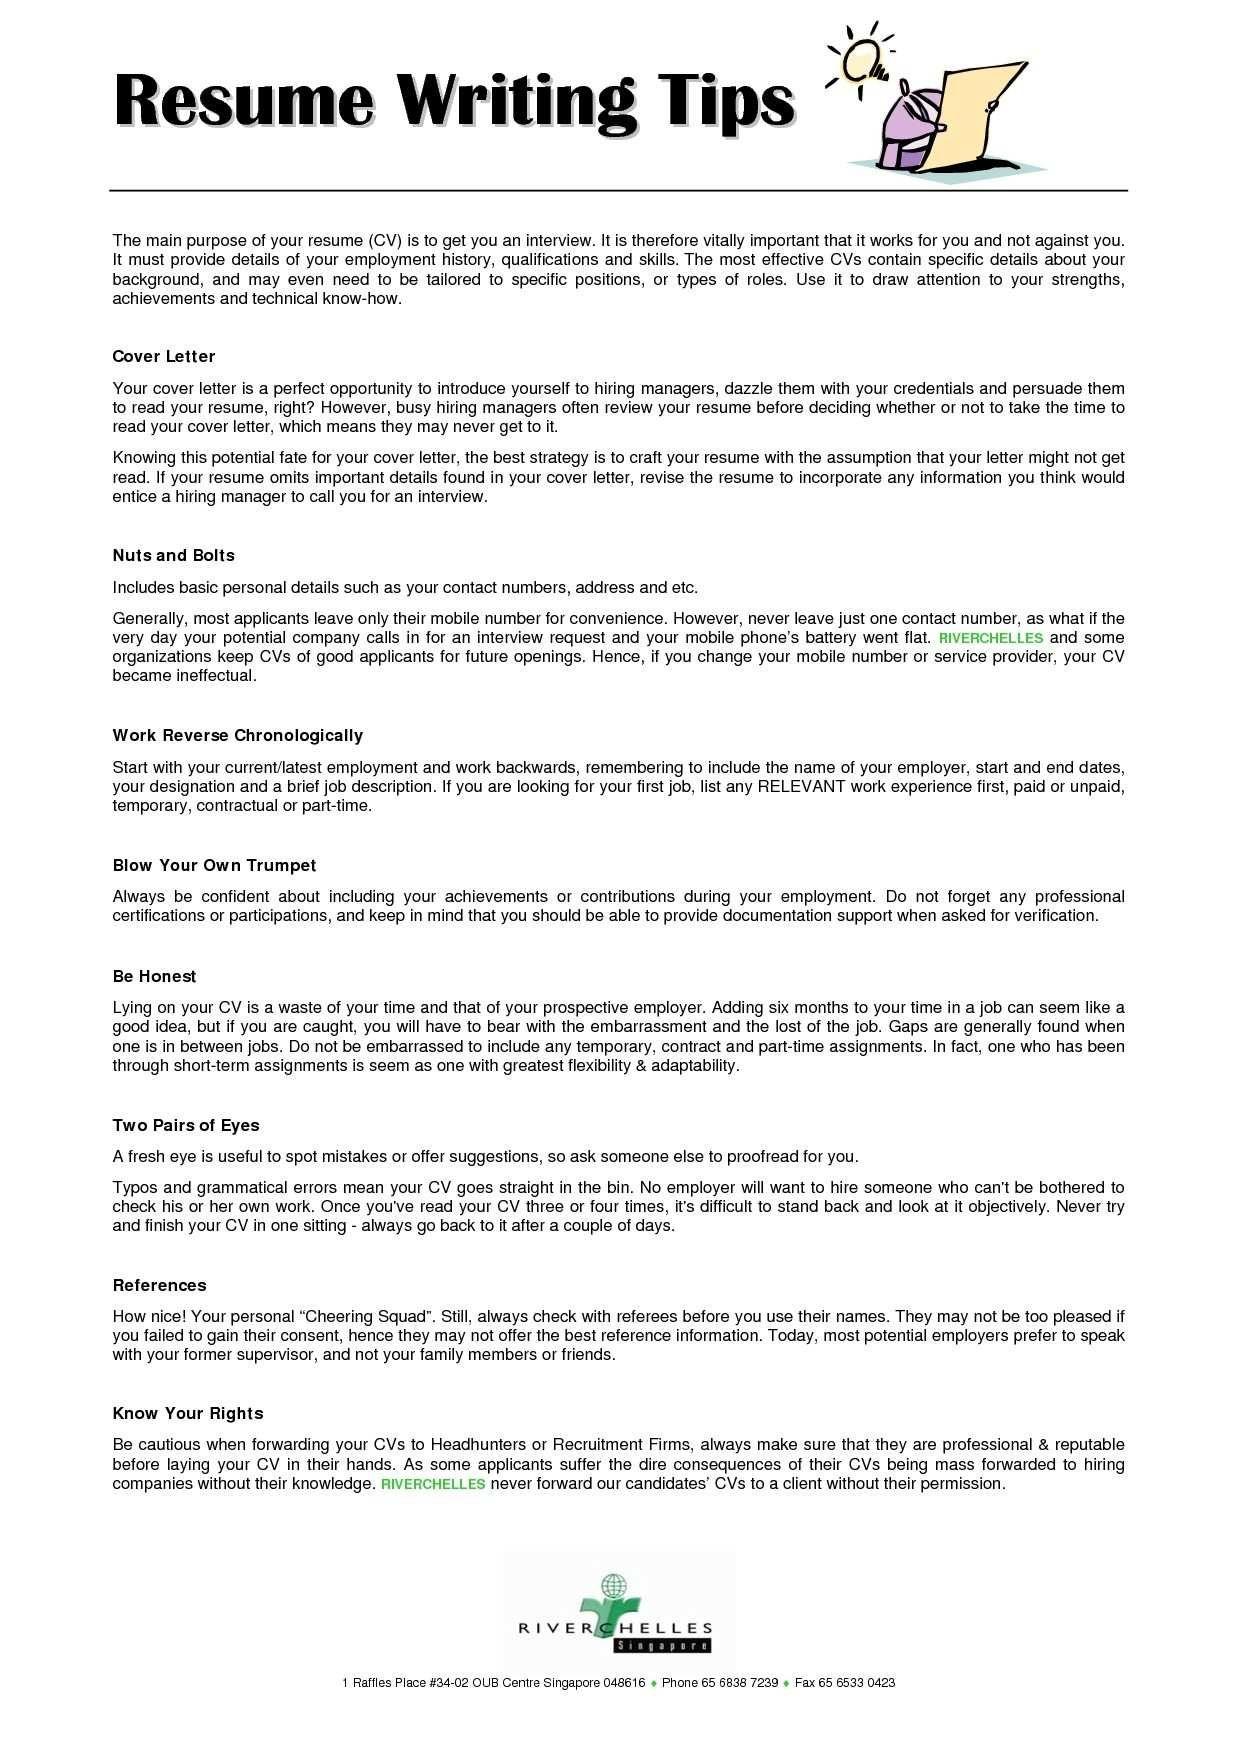 Indeed Resume Template Talktomartyb Resume writing